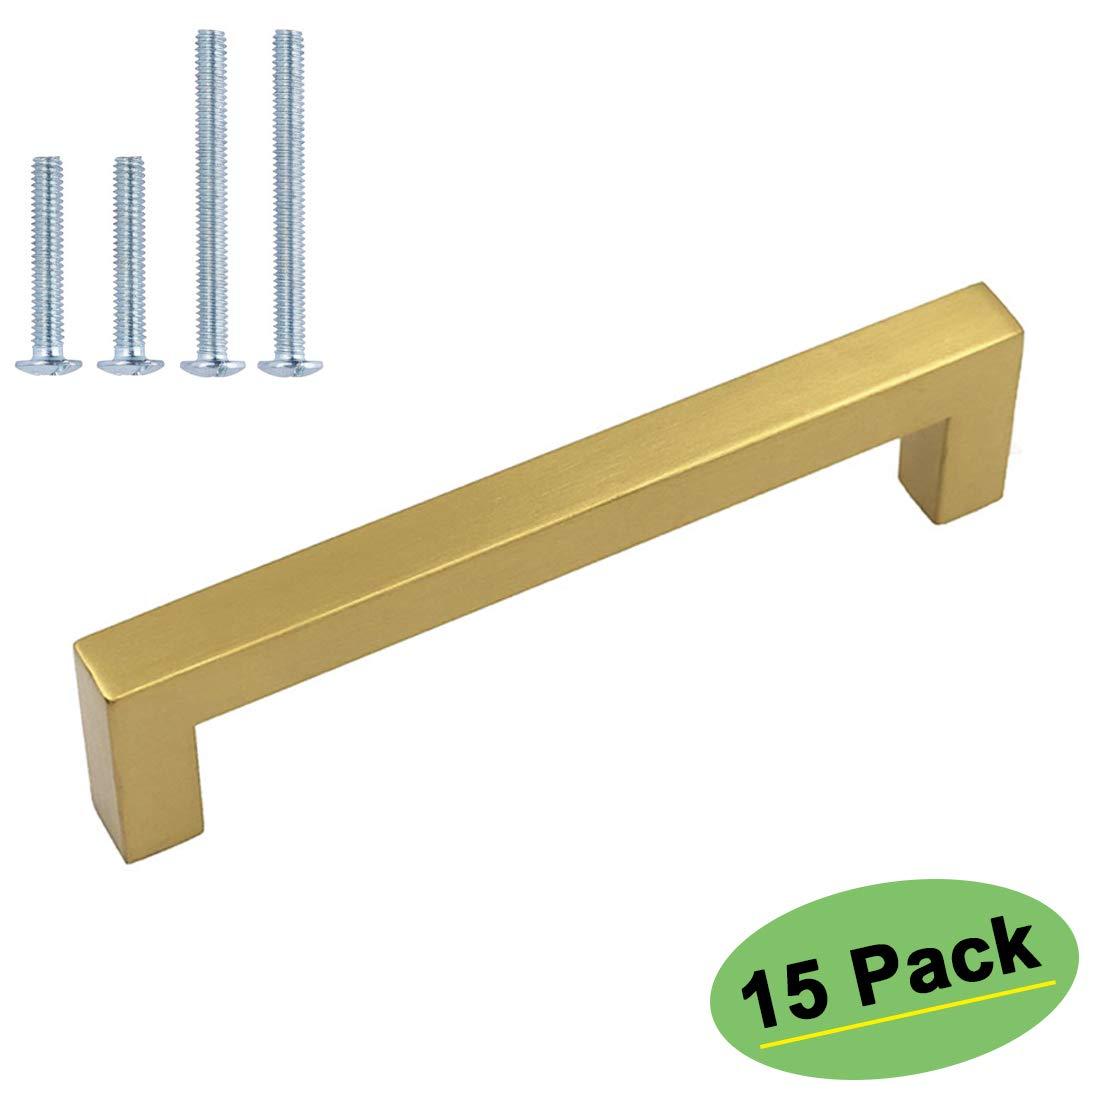 homdiy 5in Cabinet Pulls Gold Cabinet Handles 15 Pack - HDJ12GD Cabinet Drawer Pulls Metal Cabinet Handles Dresser Drawer Handles for Kithchen, Bathroom, Closet,Wardrobe